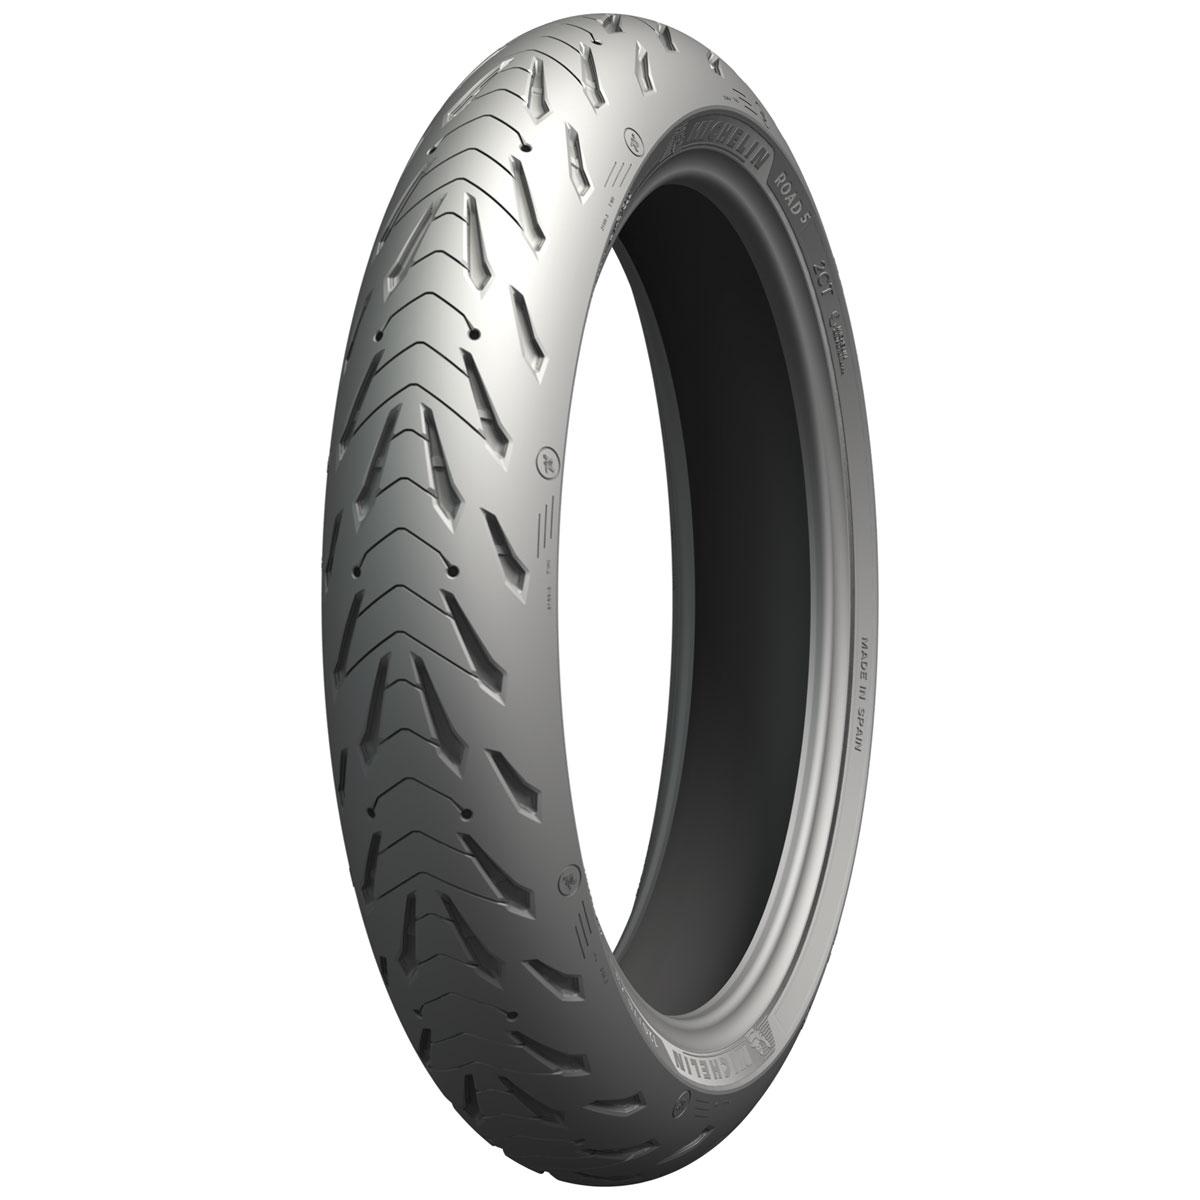 Michelin Road 5 120/60ZR17 Front Tire